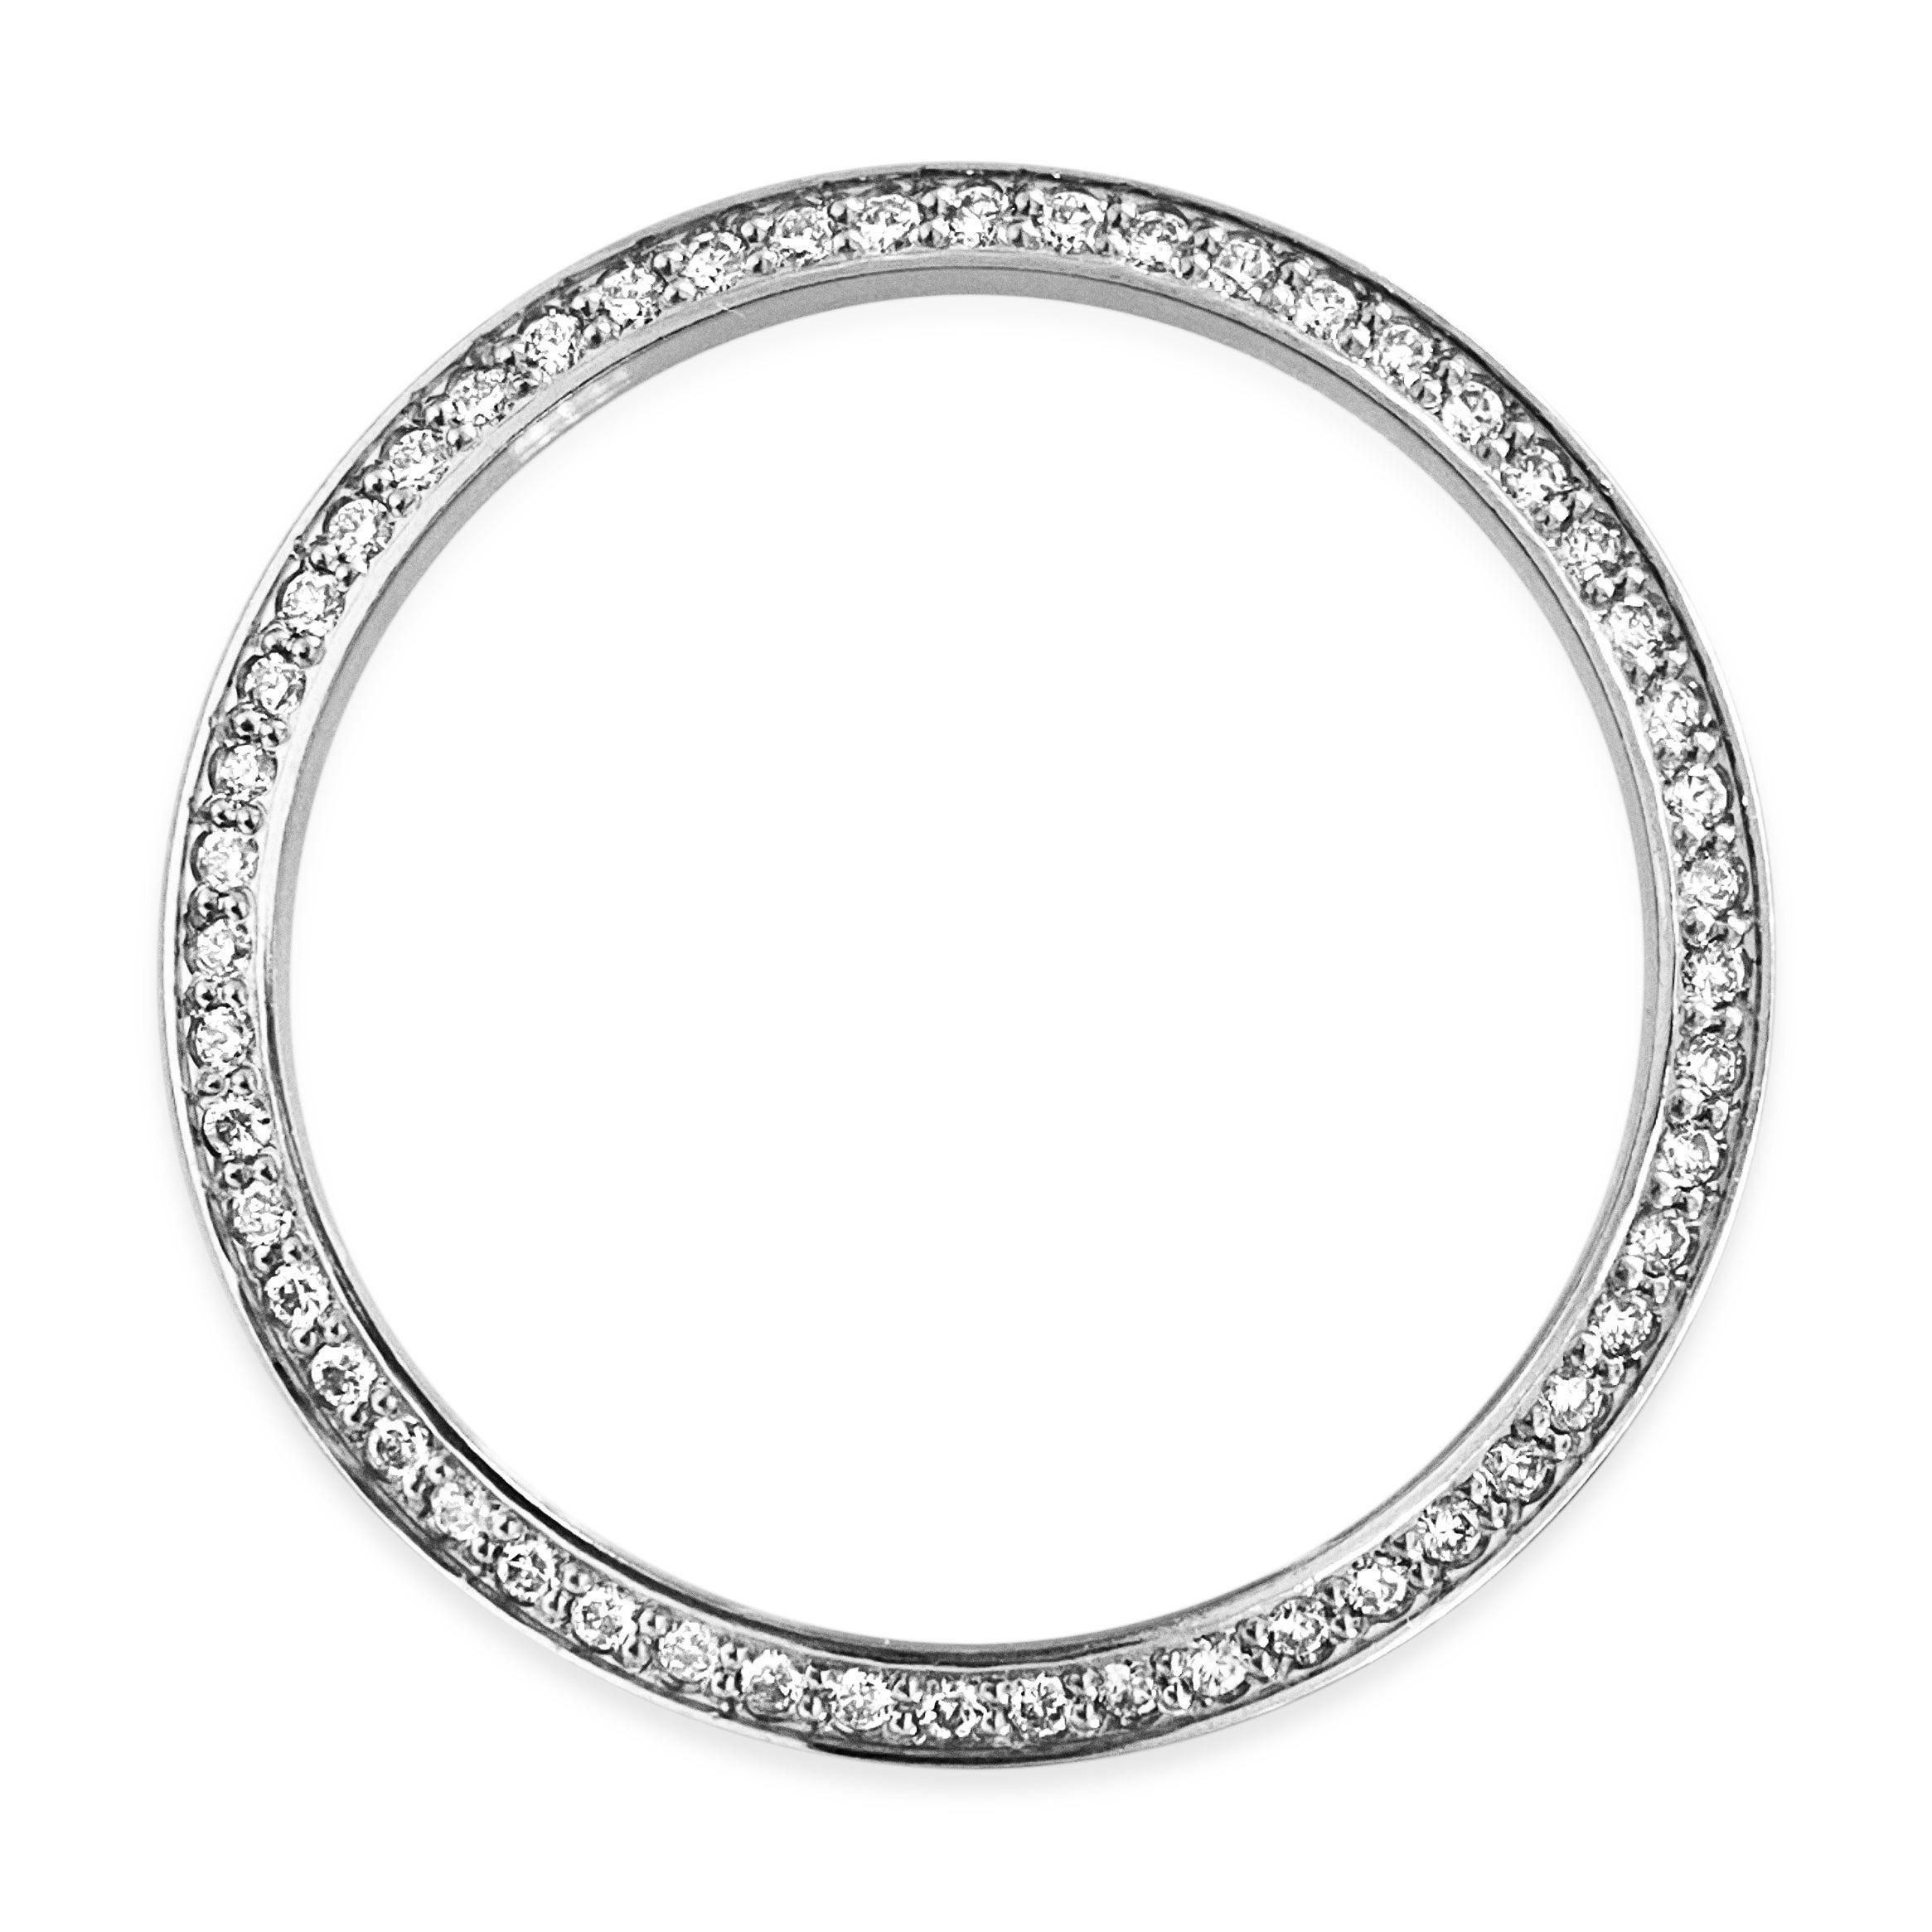 Rolex Stainless Steel 1.00 Carat VVS Diamond Bezel